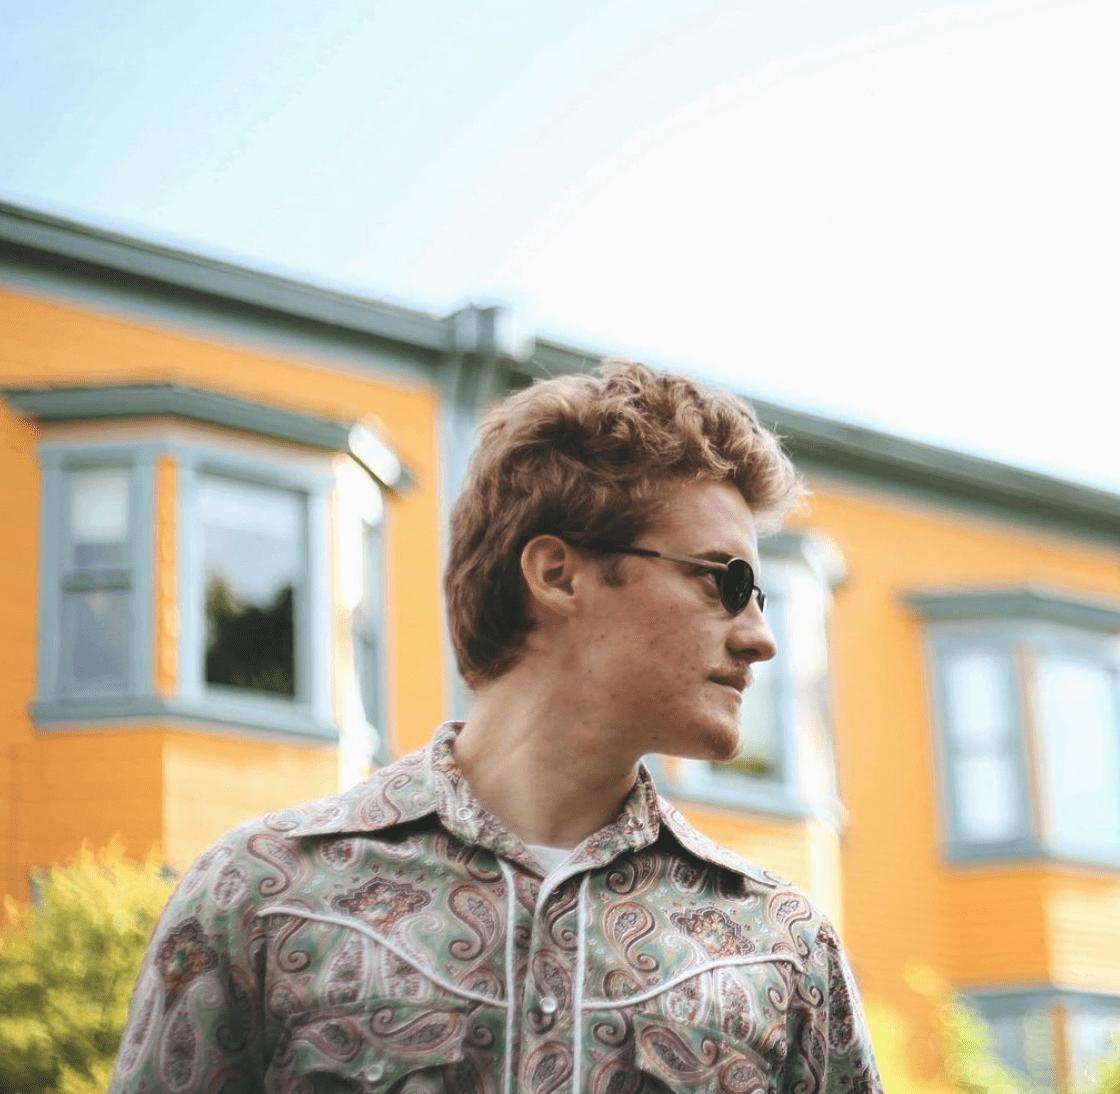 Jacob Ezra Drops New Project, 'The Organic Sounds'